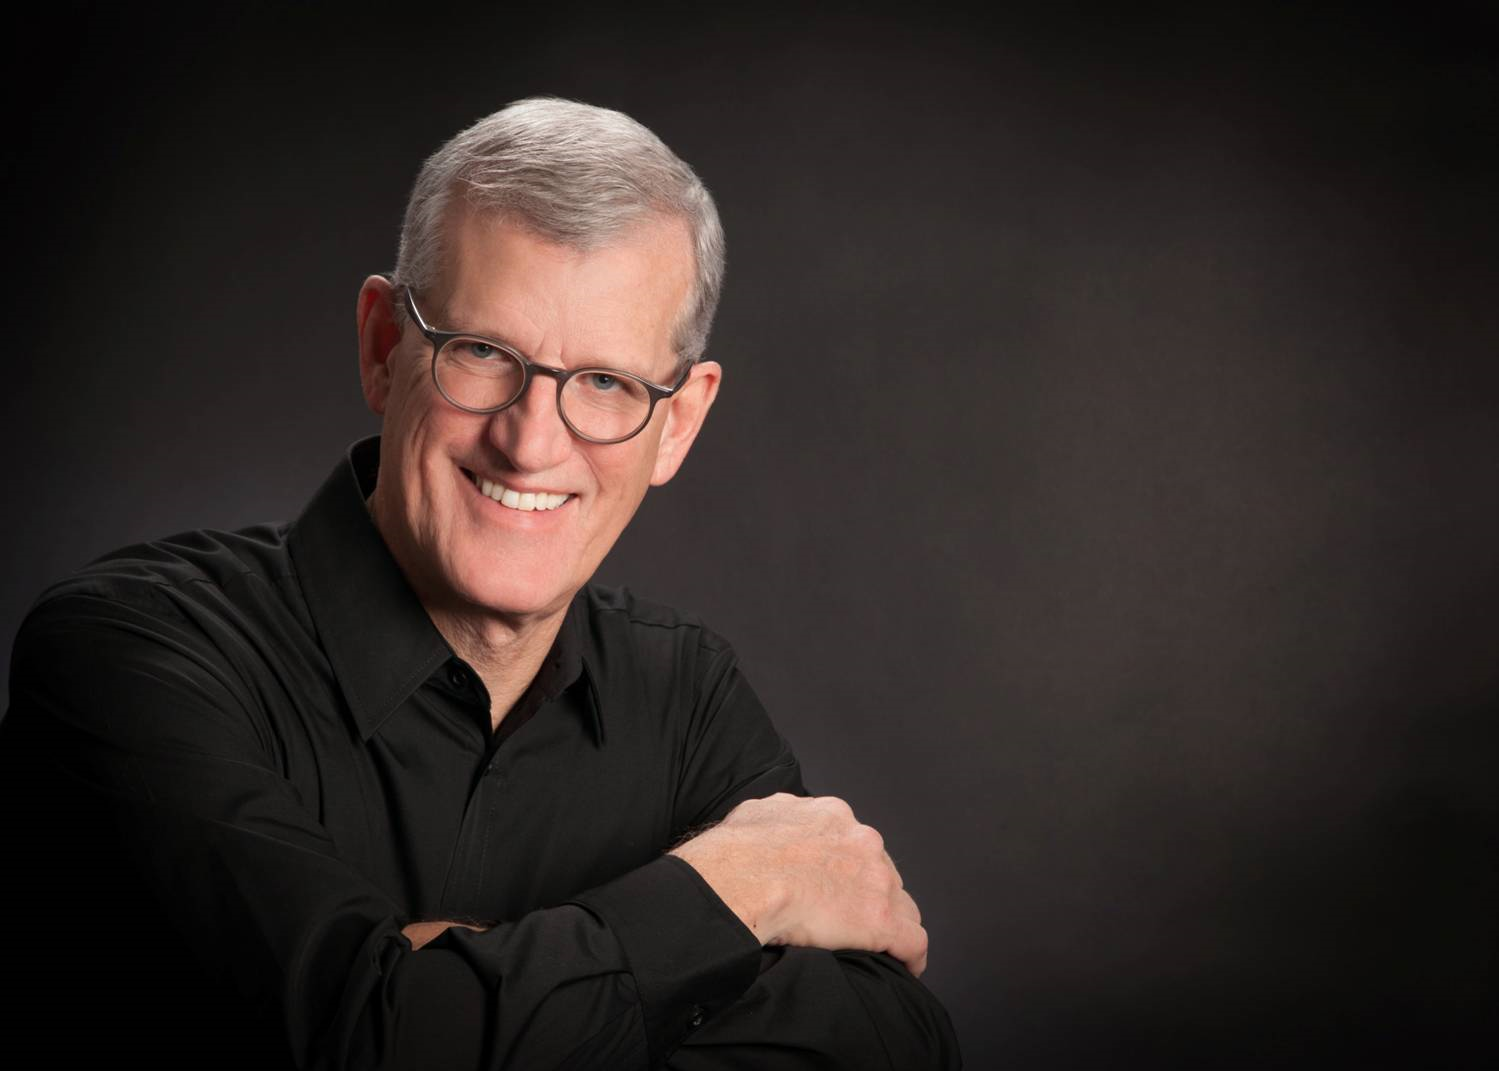 Allan Ripley : Erie County Music Educator's Association (ECMEA)